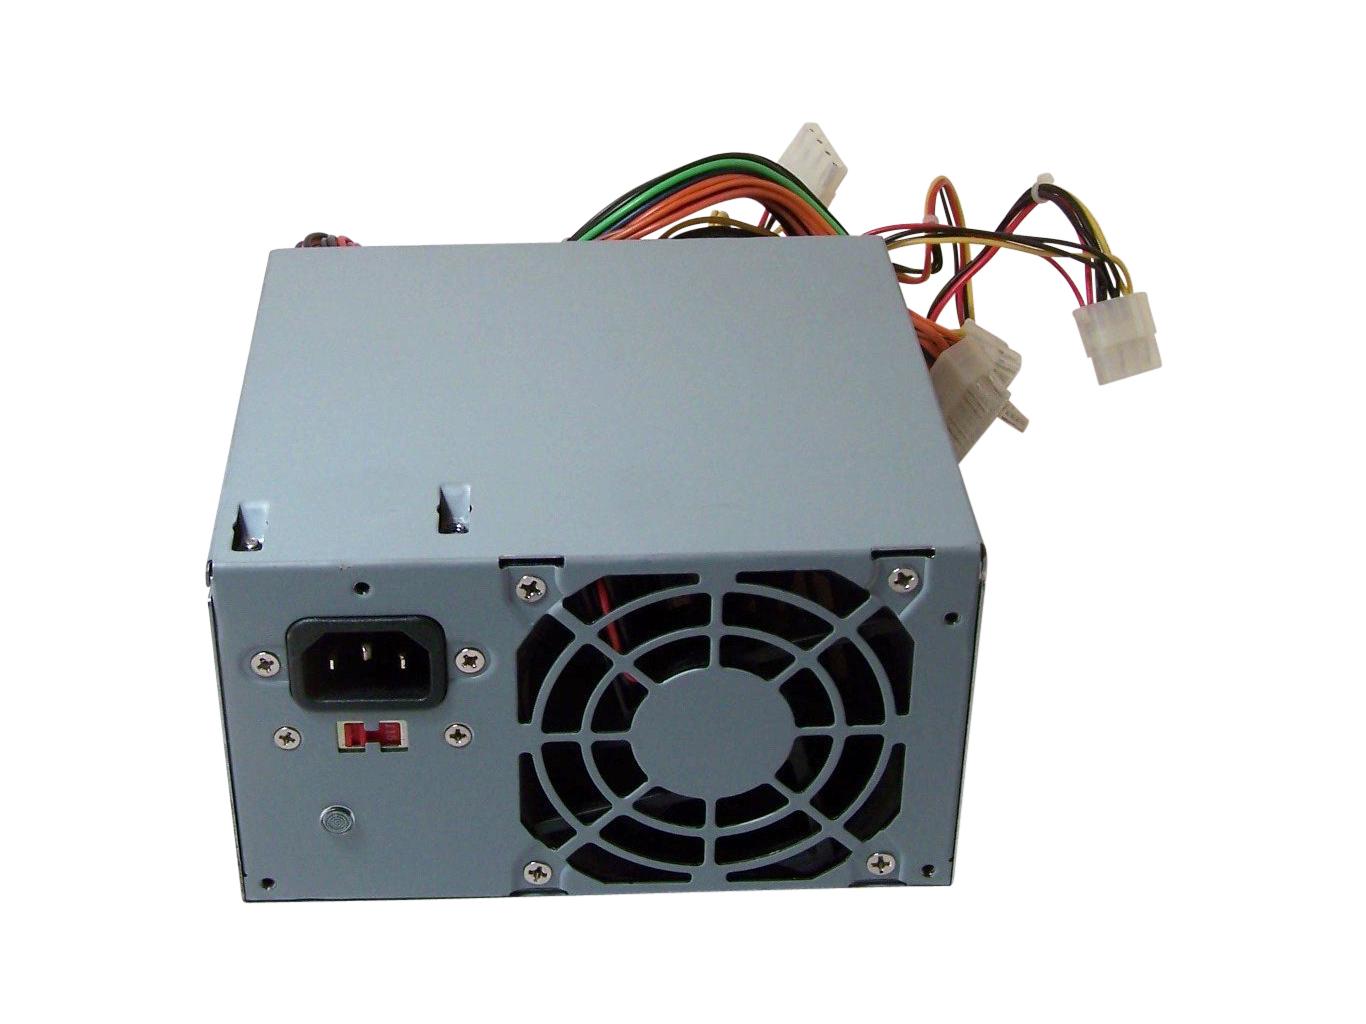 HP Atx25012Z Genuine Power Supply 250 Watt 20 Pin Atx Zinfandel